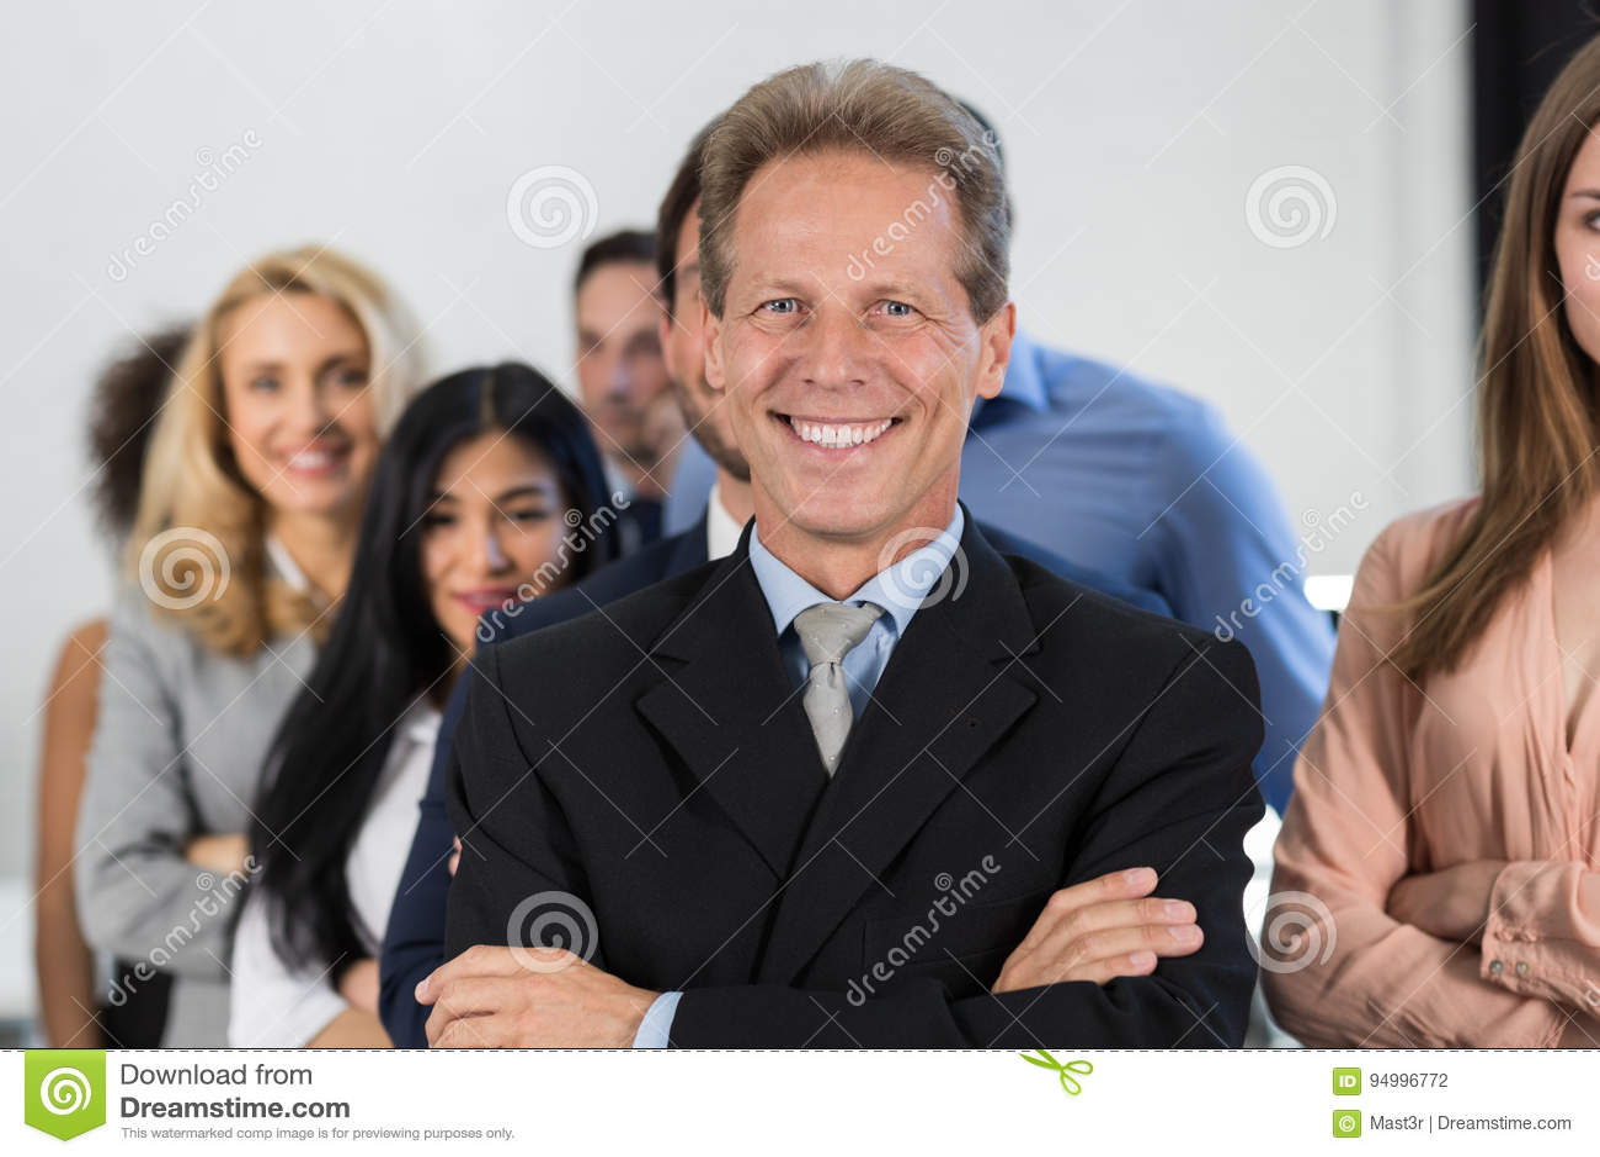 Lyckad affärsmanframstickandeOver Businesspeople Group bakgrund, mogen ledare With Business People Team Confident Hold